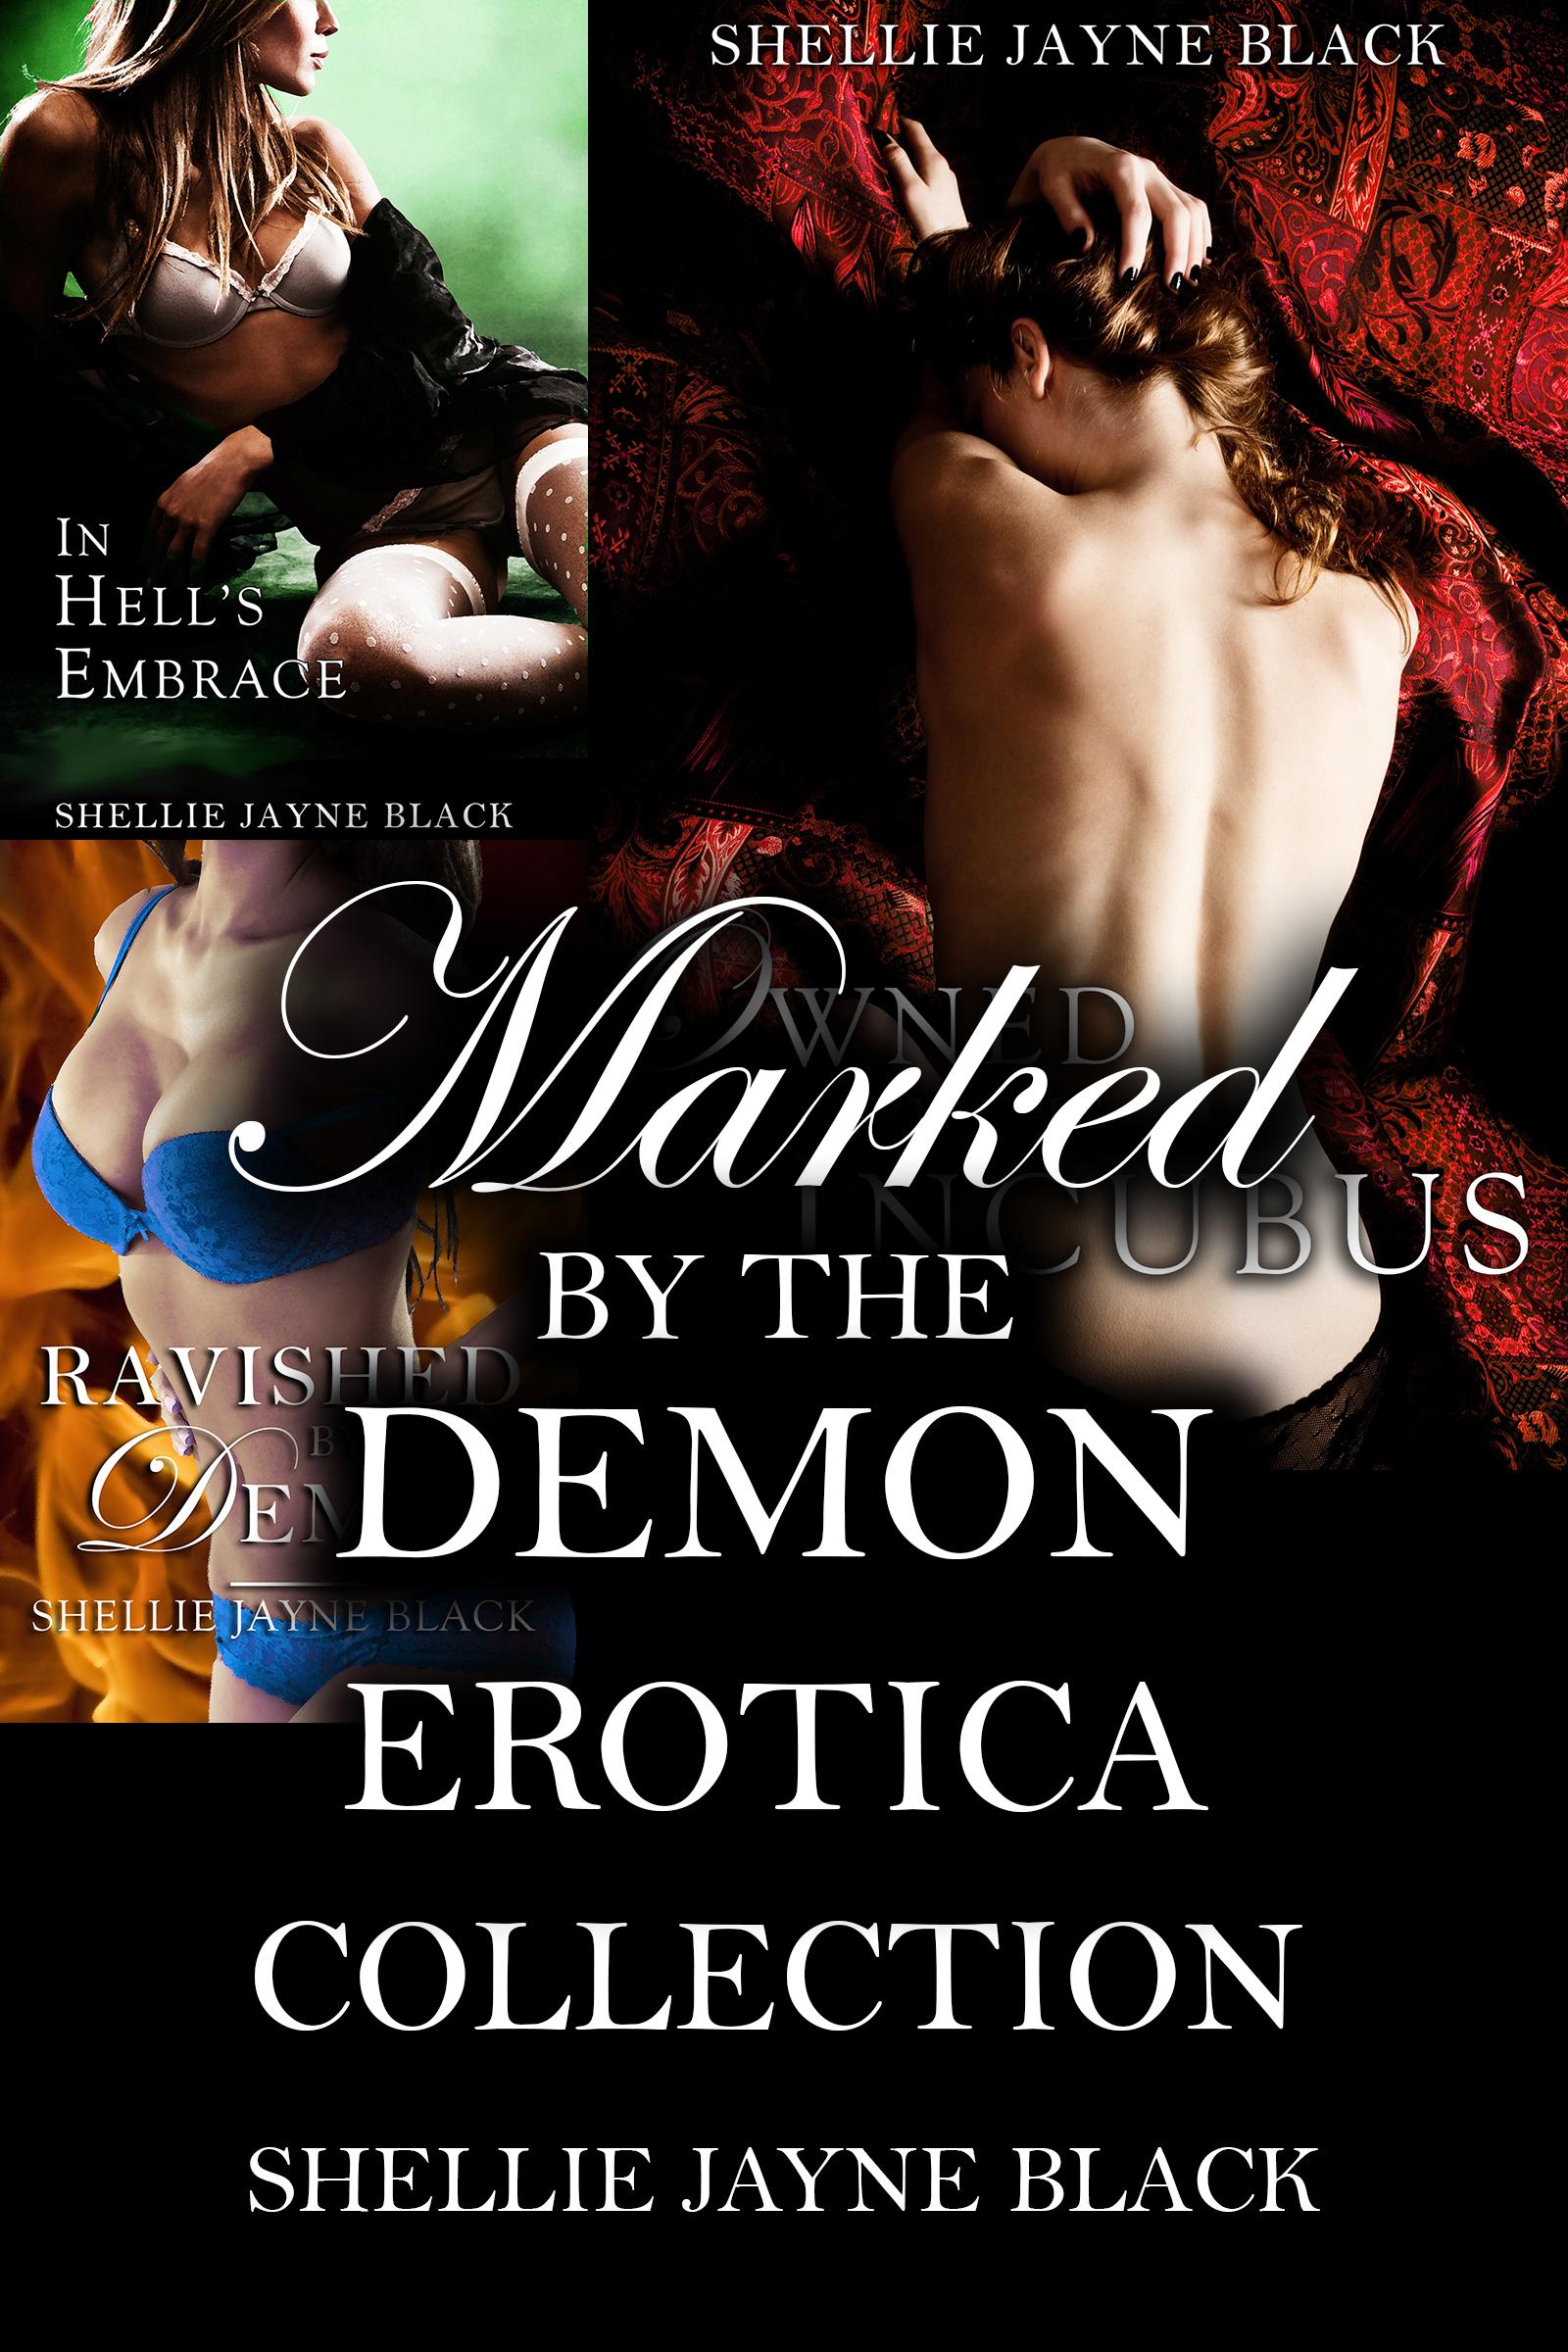 Erotic stories demon porn image